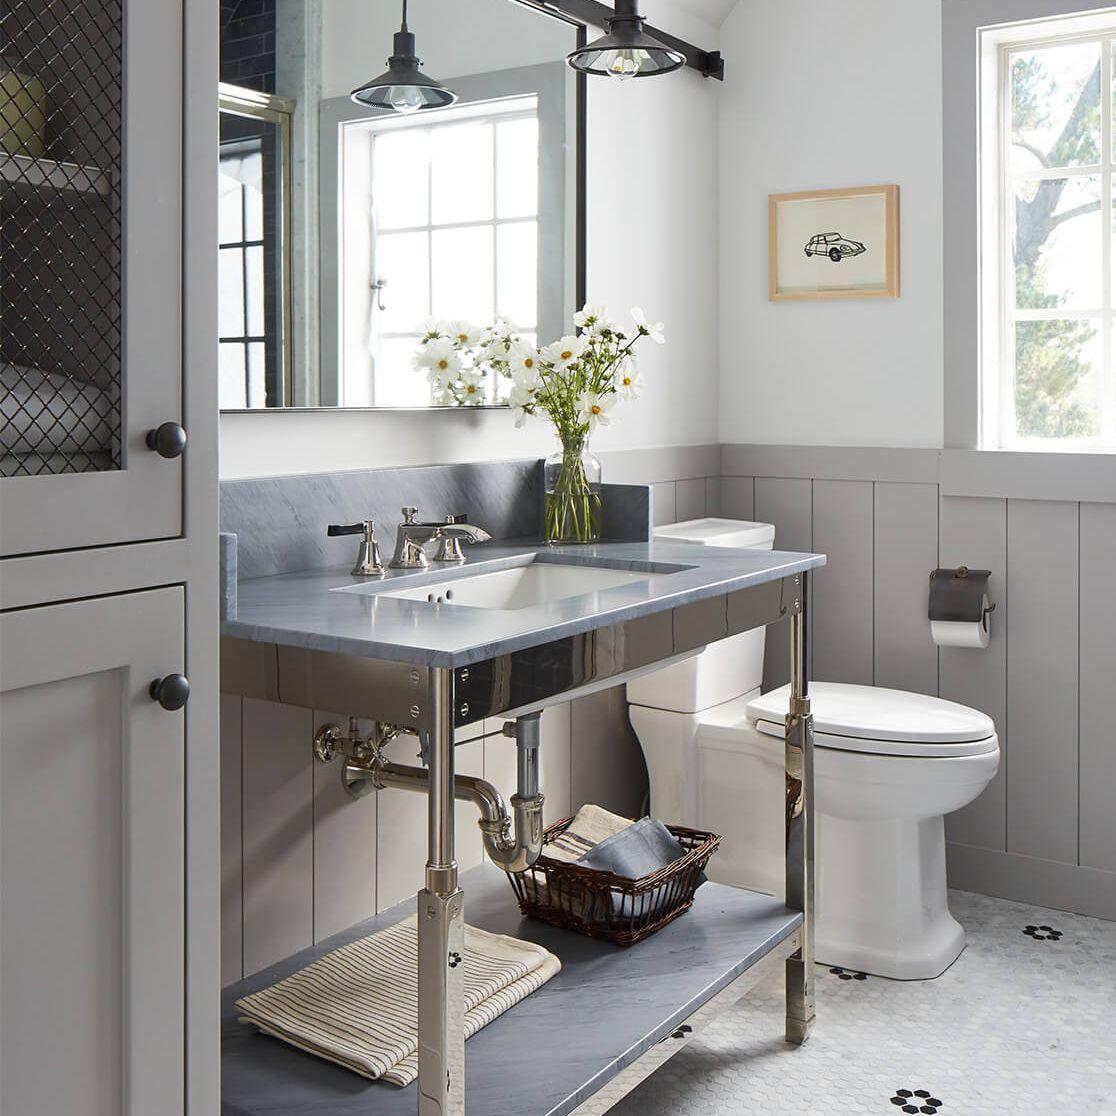 Tiled bathroom in gray and blue tones, industrial light fixtures